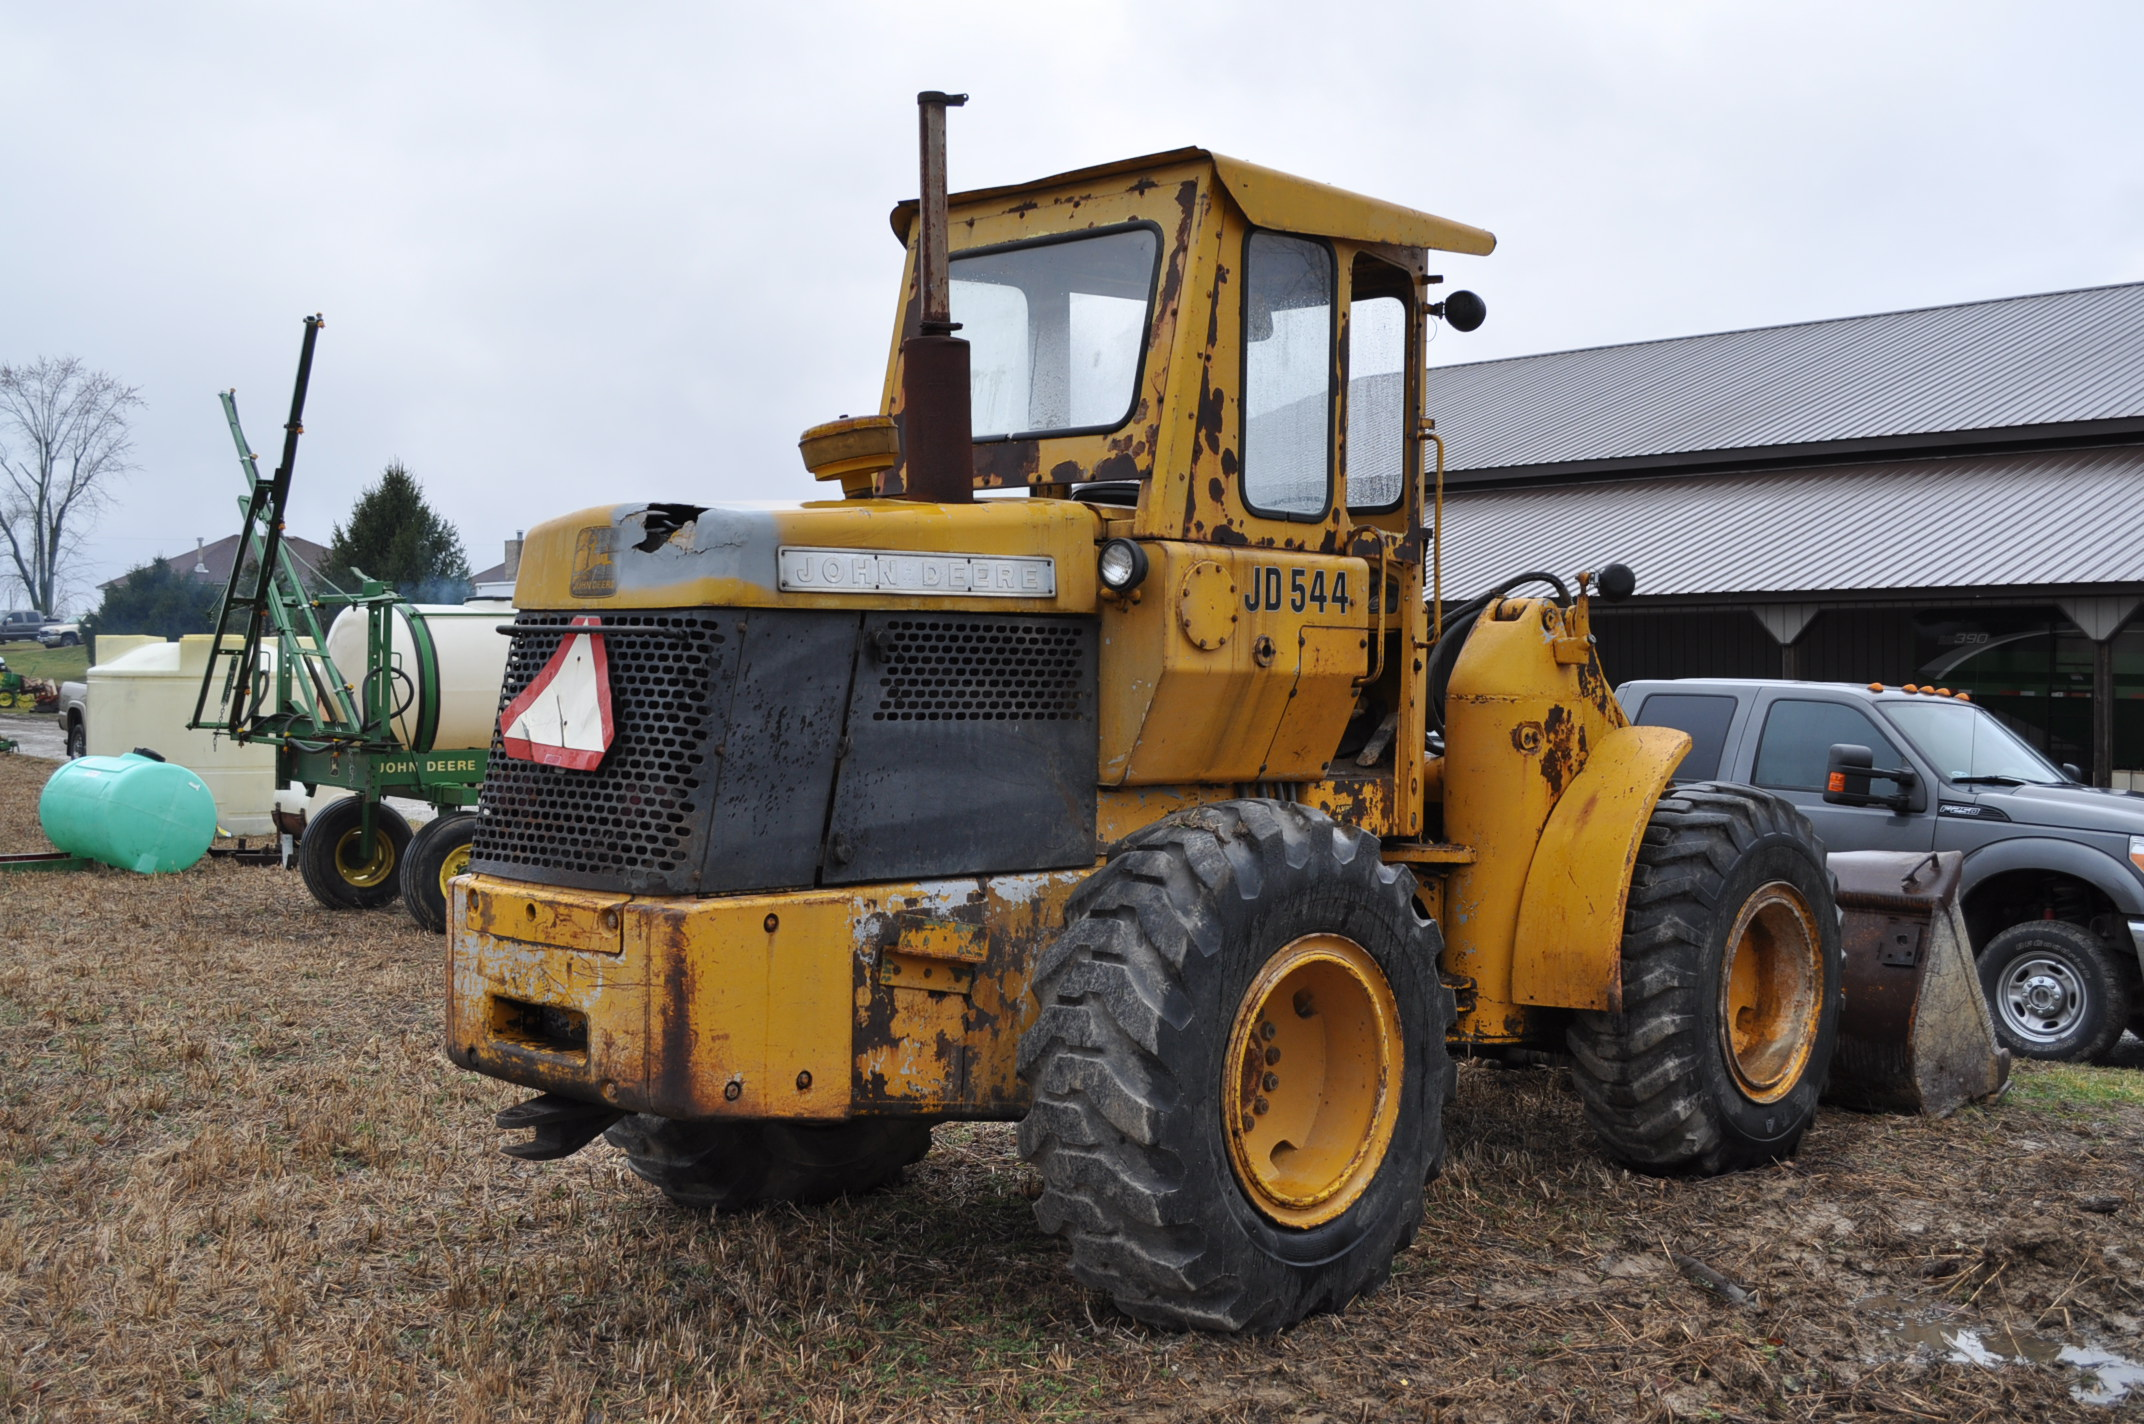 John Deere 544 Payloader, 17.5-25 tires, shows 1074 hrs, SN 0767621 - Image 3 of 16